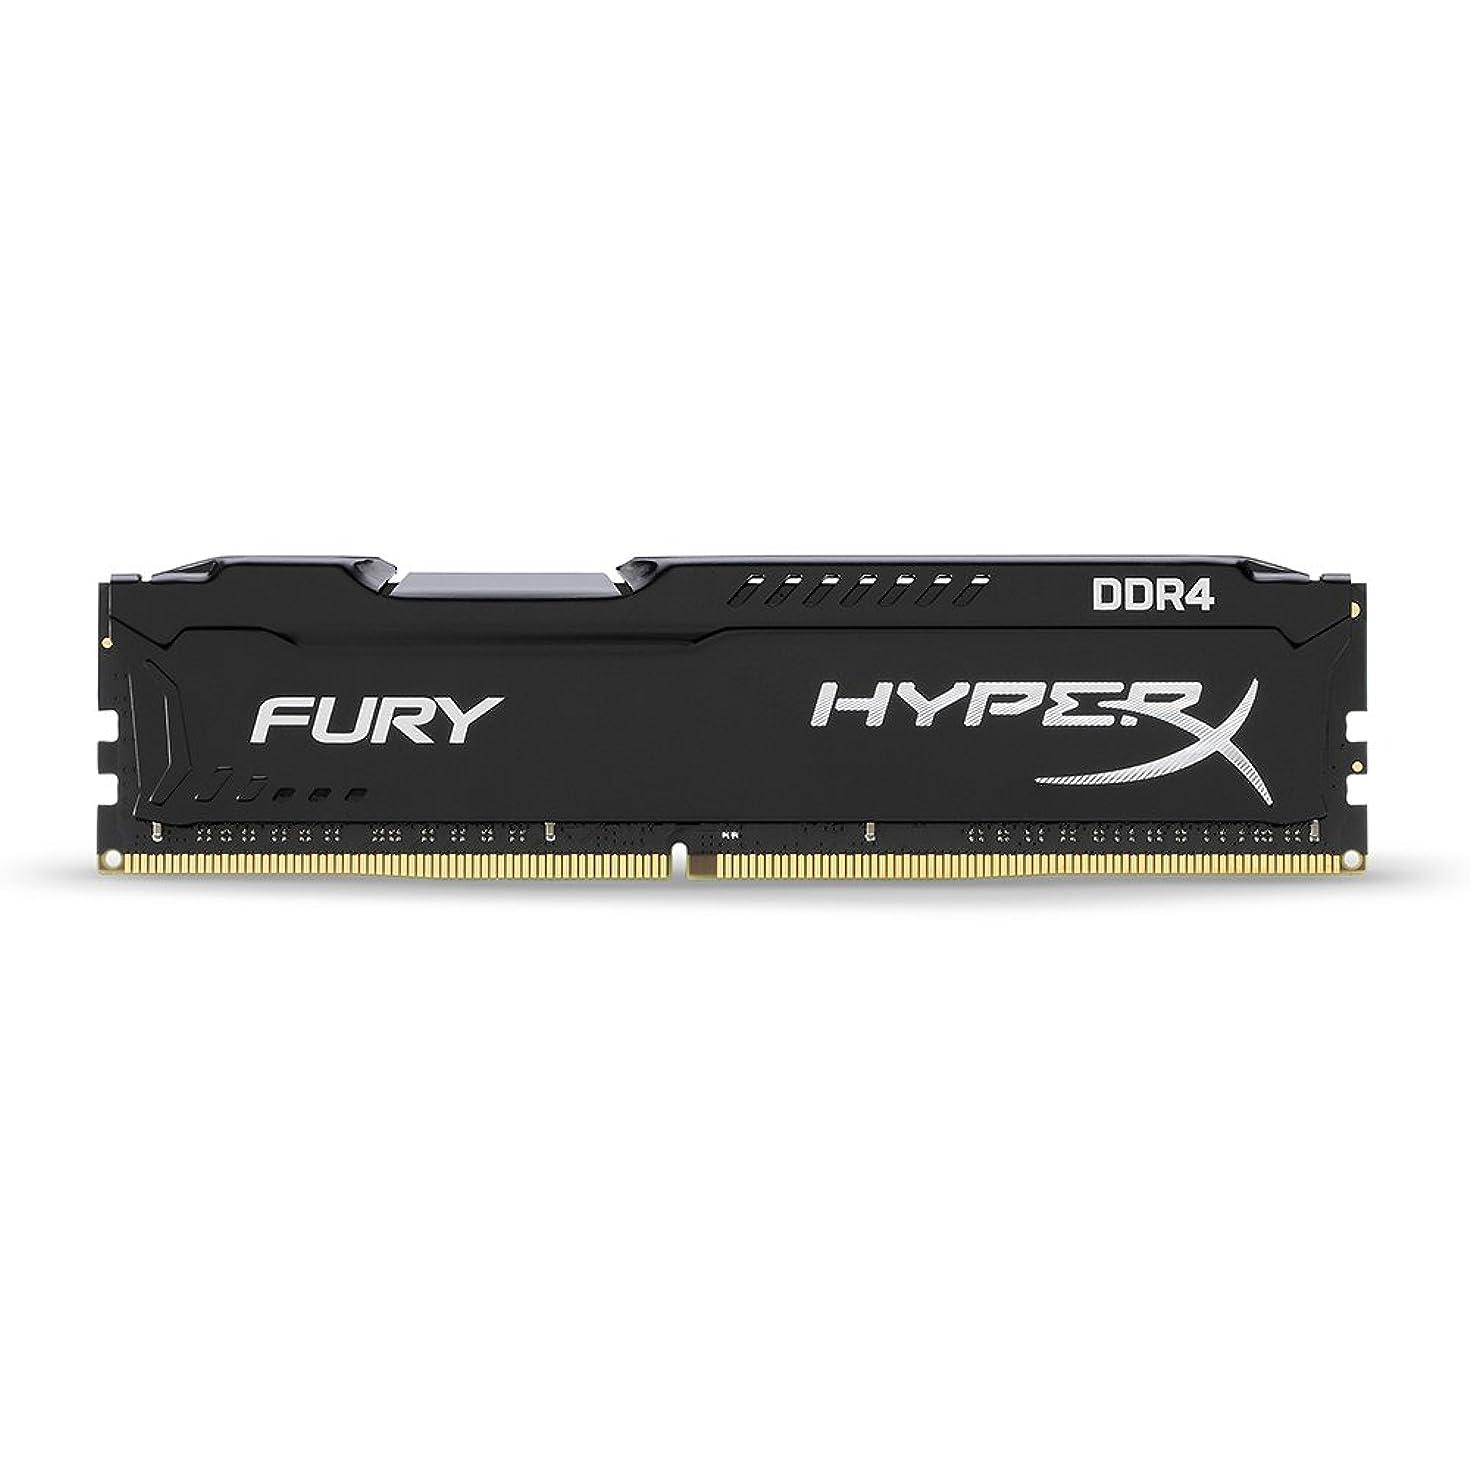 Kingston Technology HyperX Fury Black 16GB 2666MHz DDR4 CL16 DIMM (HX426C16FB/16)